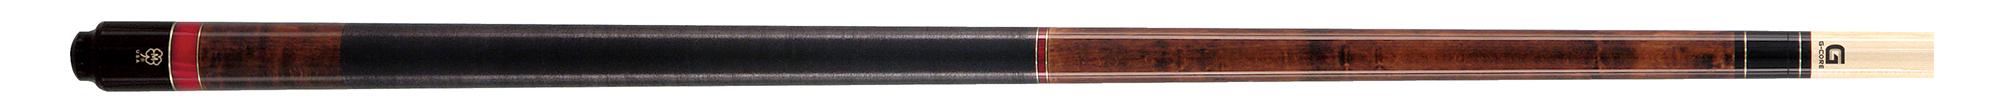 PK3006: McDermott G209 Dark English pool Gewicht: 19Oz #1